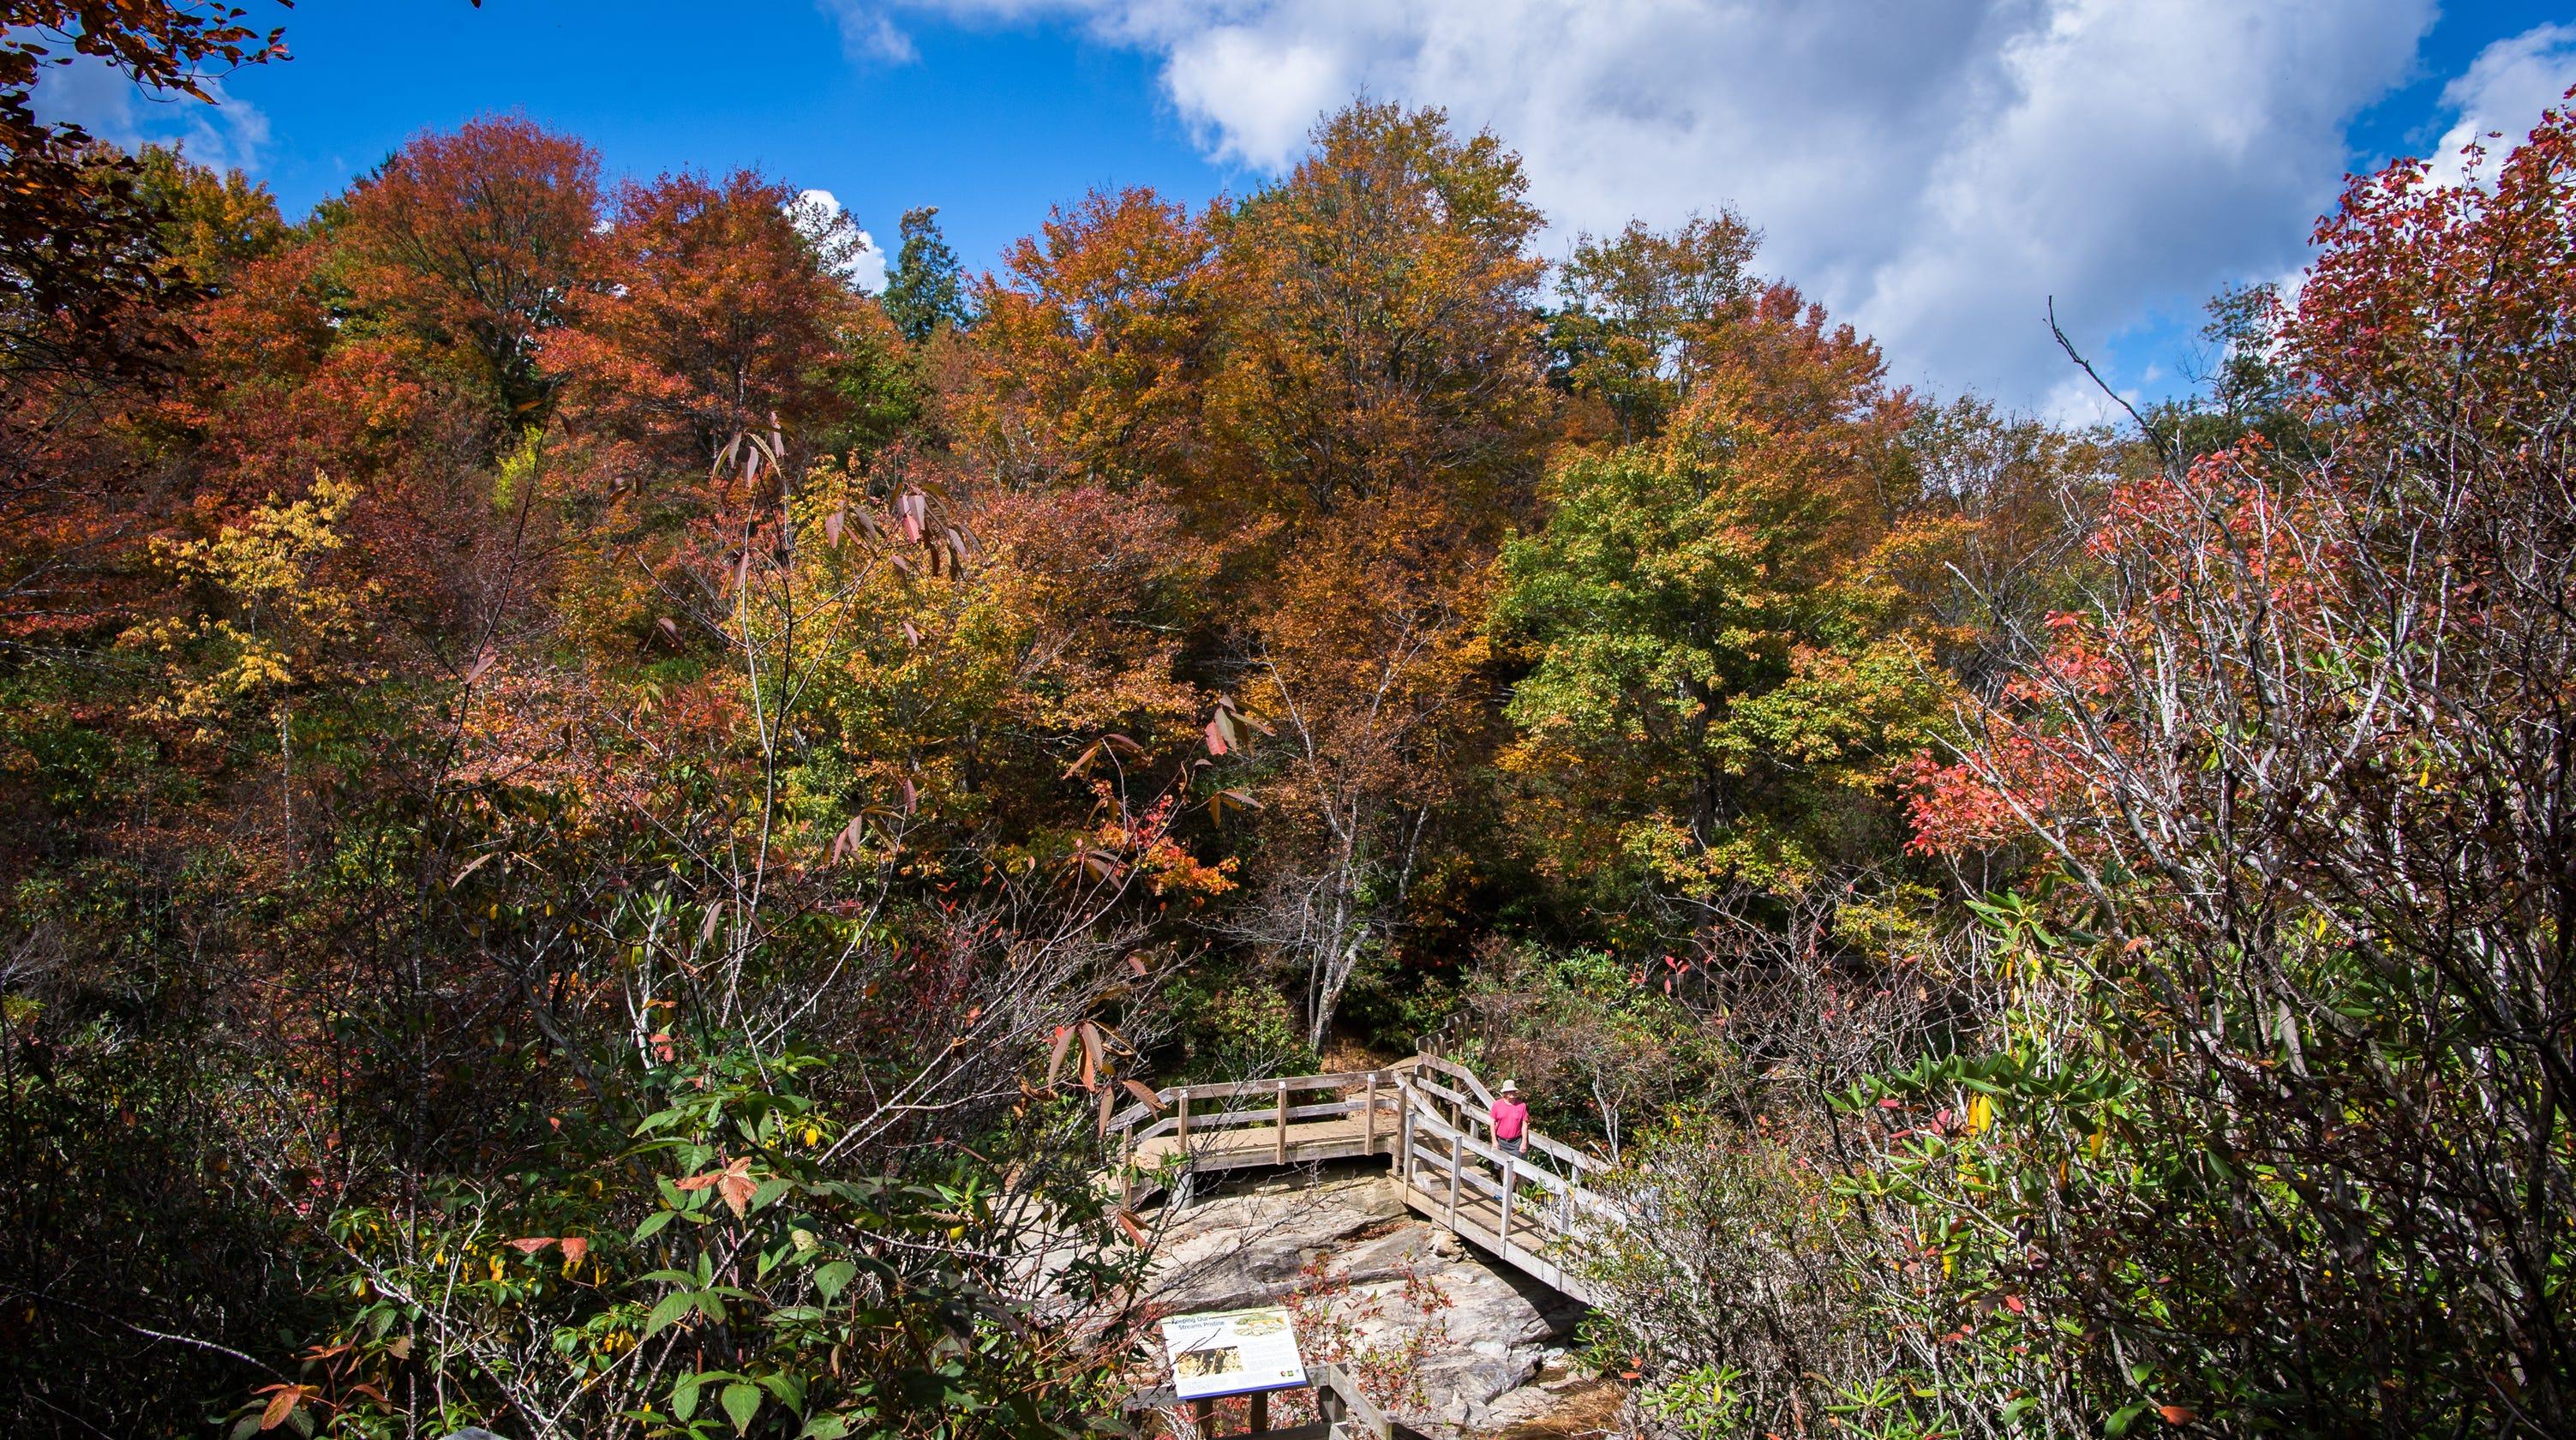 WNC Leaf Experts Give Their 2018 Fall Foliage Forecast